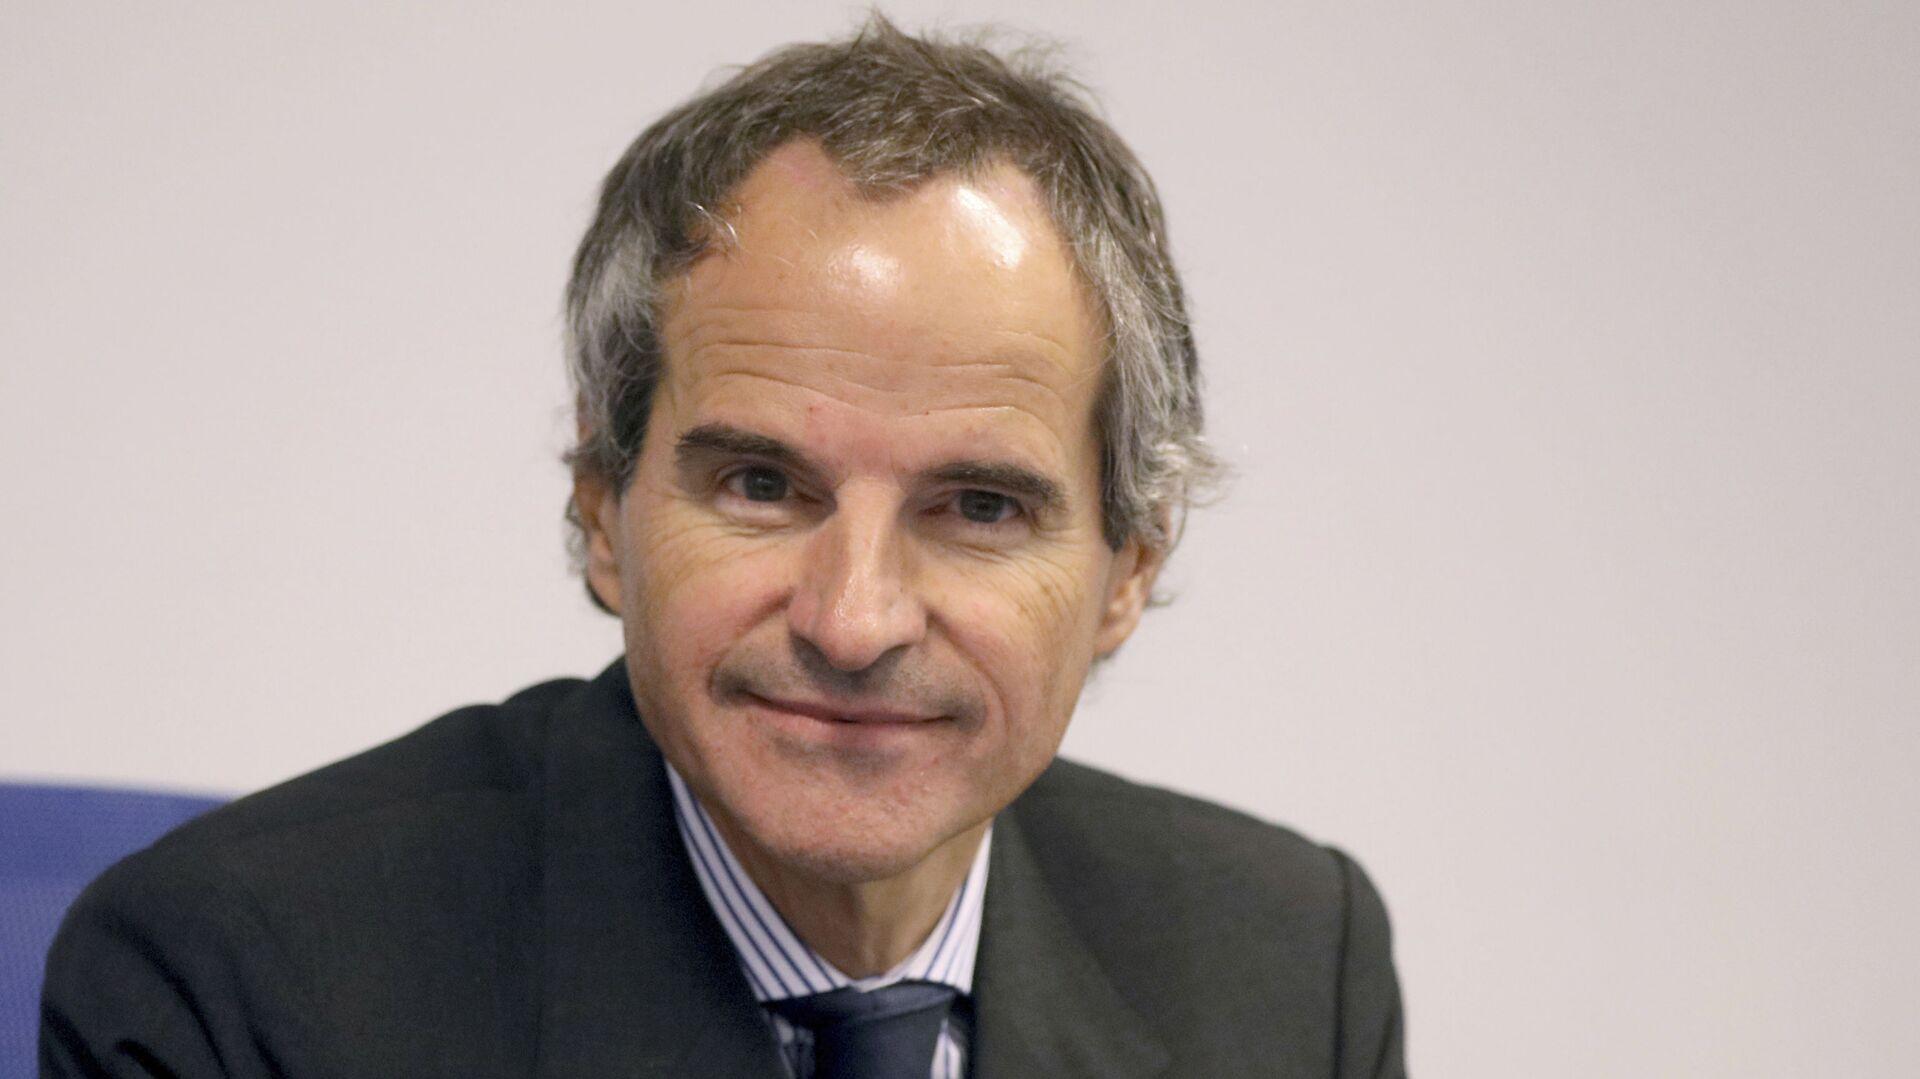 Rafael Grossi, director general electo del OIEA - Sputnik Mundo, 1920, 11.09.2021